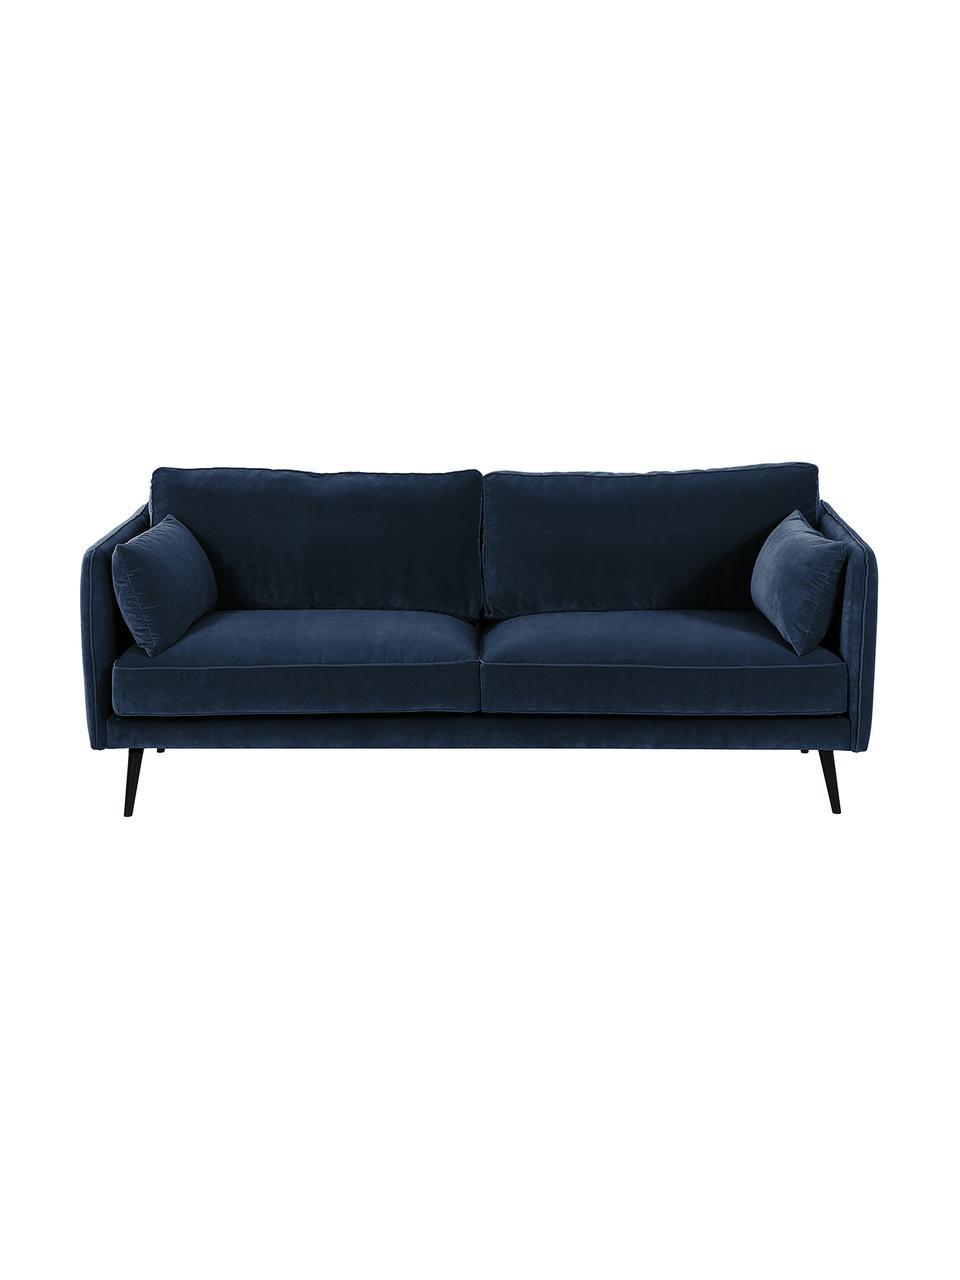 Samt-Sofa Paola (3-Sitzer) in Blau mit Holz-Füßen, Bezug: Samt (Polyester) 70.000 S, Gestell: Massives Fichtenholz, Spa, Füße: Fichtenholz, lackiert, Samt Blau, 209 x 86 cm